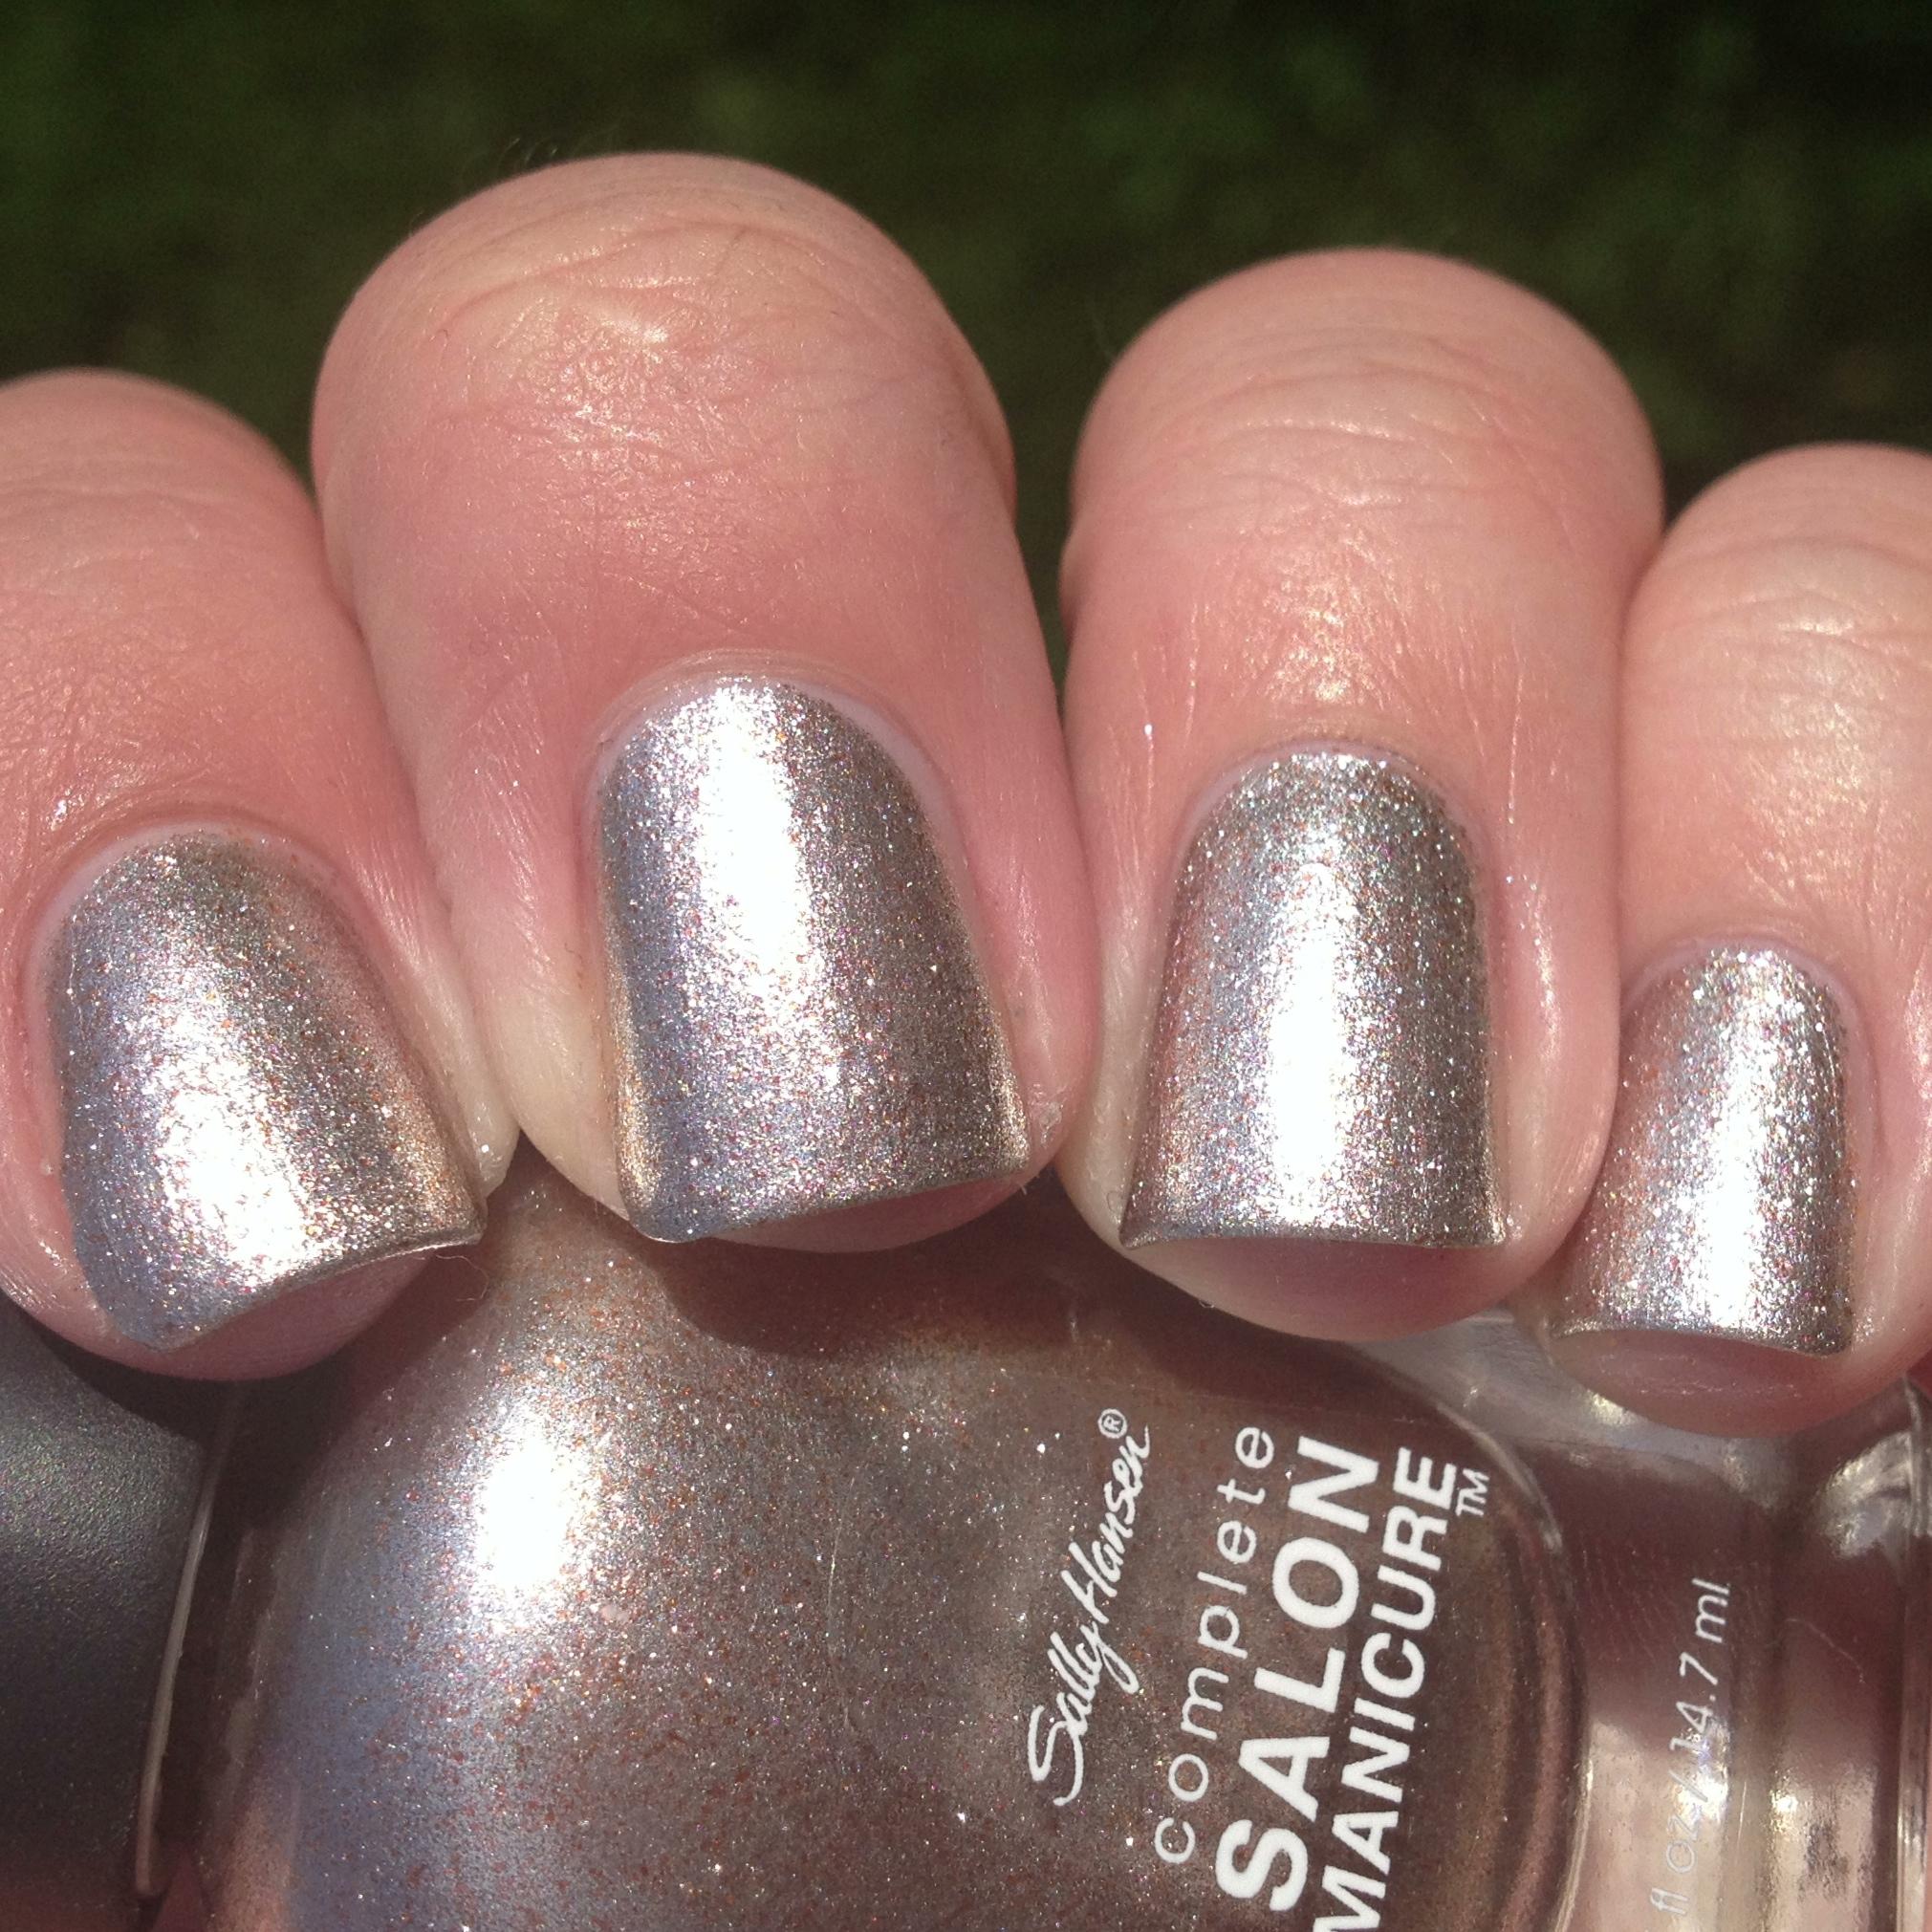 sally hansen complete salon manicure hi ho silver & gilty party